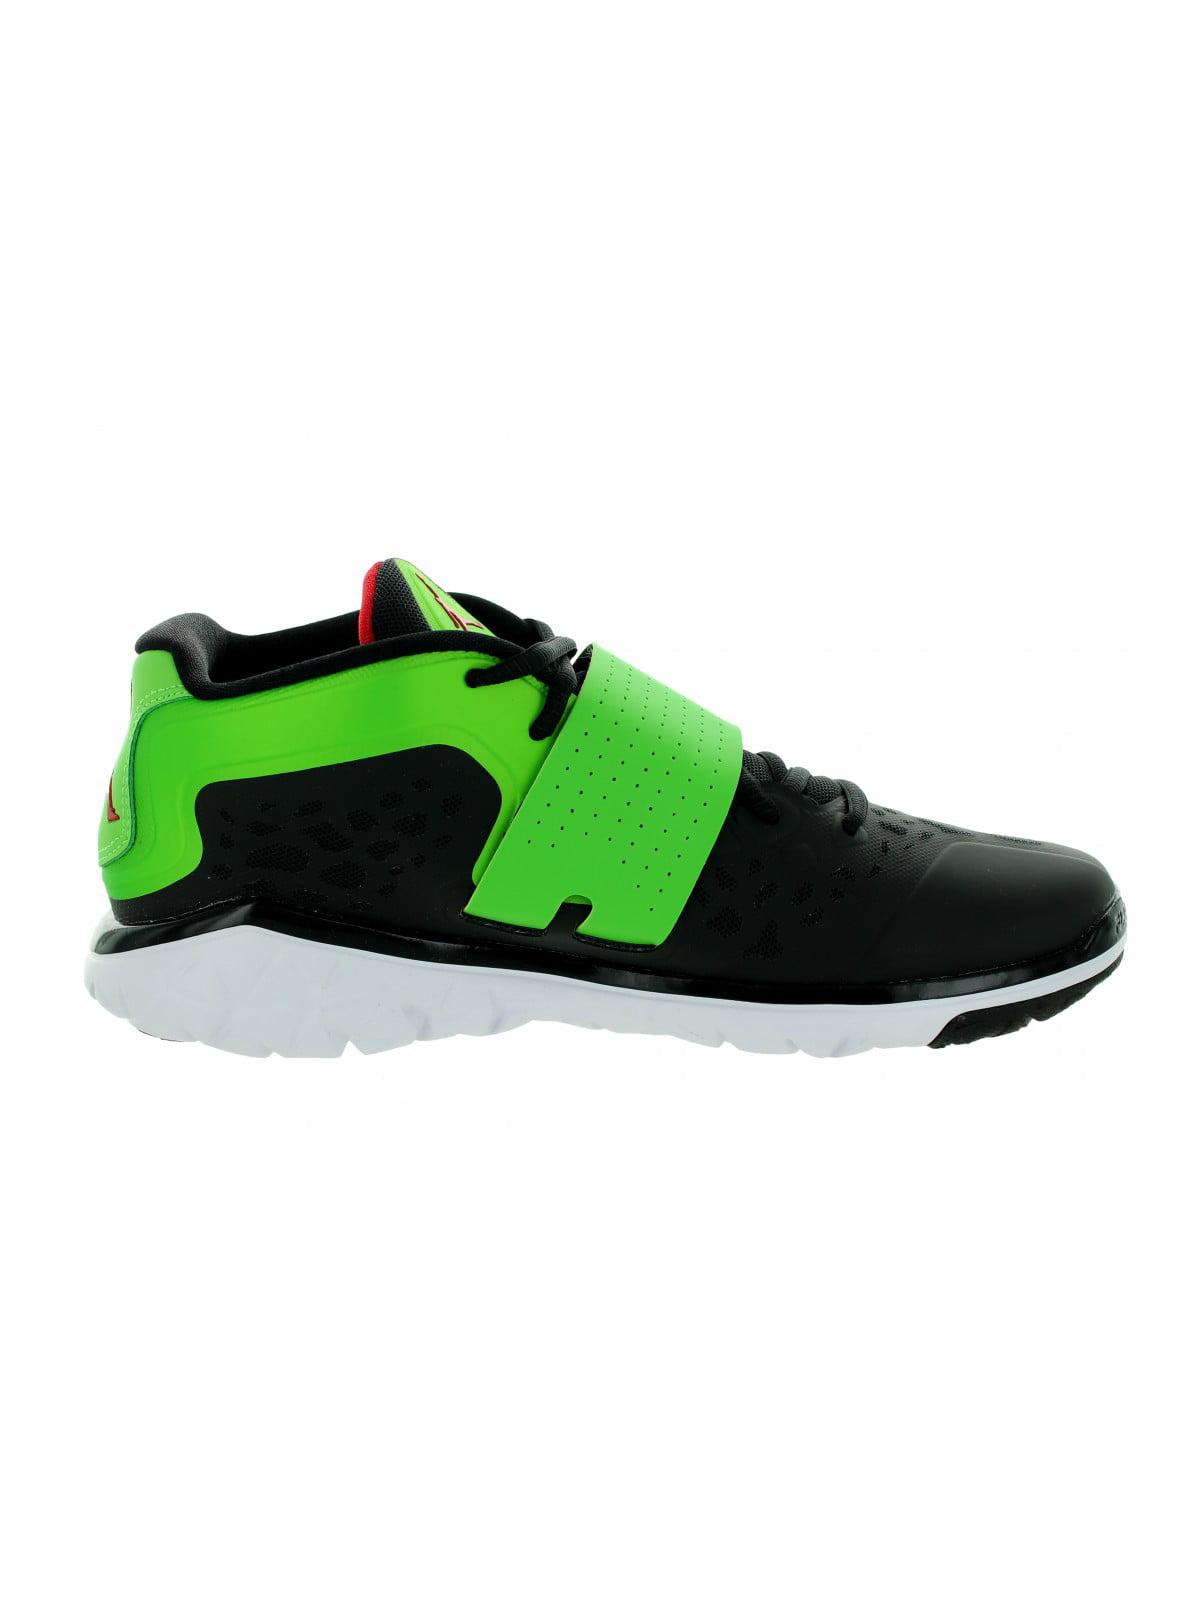 Nike Jordan Men's 2 Jordan Flight Flex Trainer 2 Men's Training Shoe 83ec5a